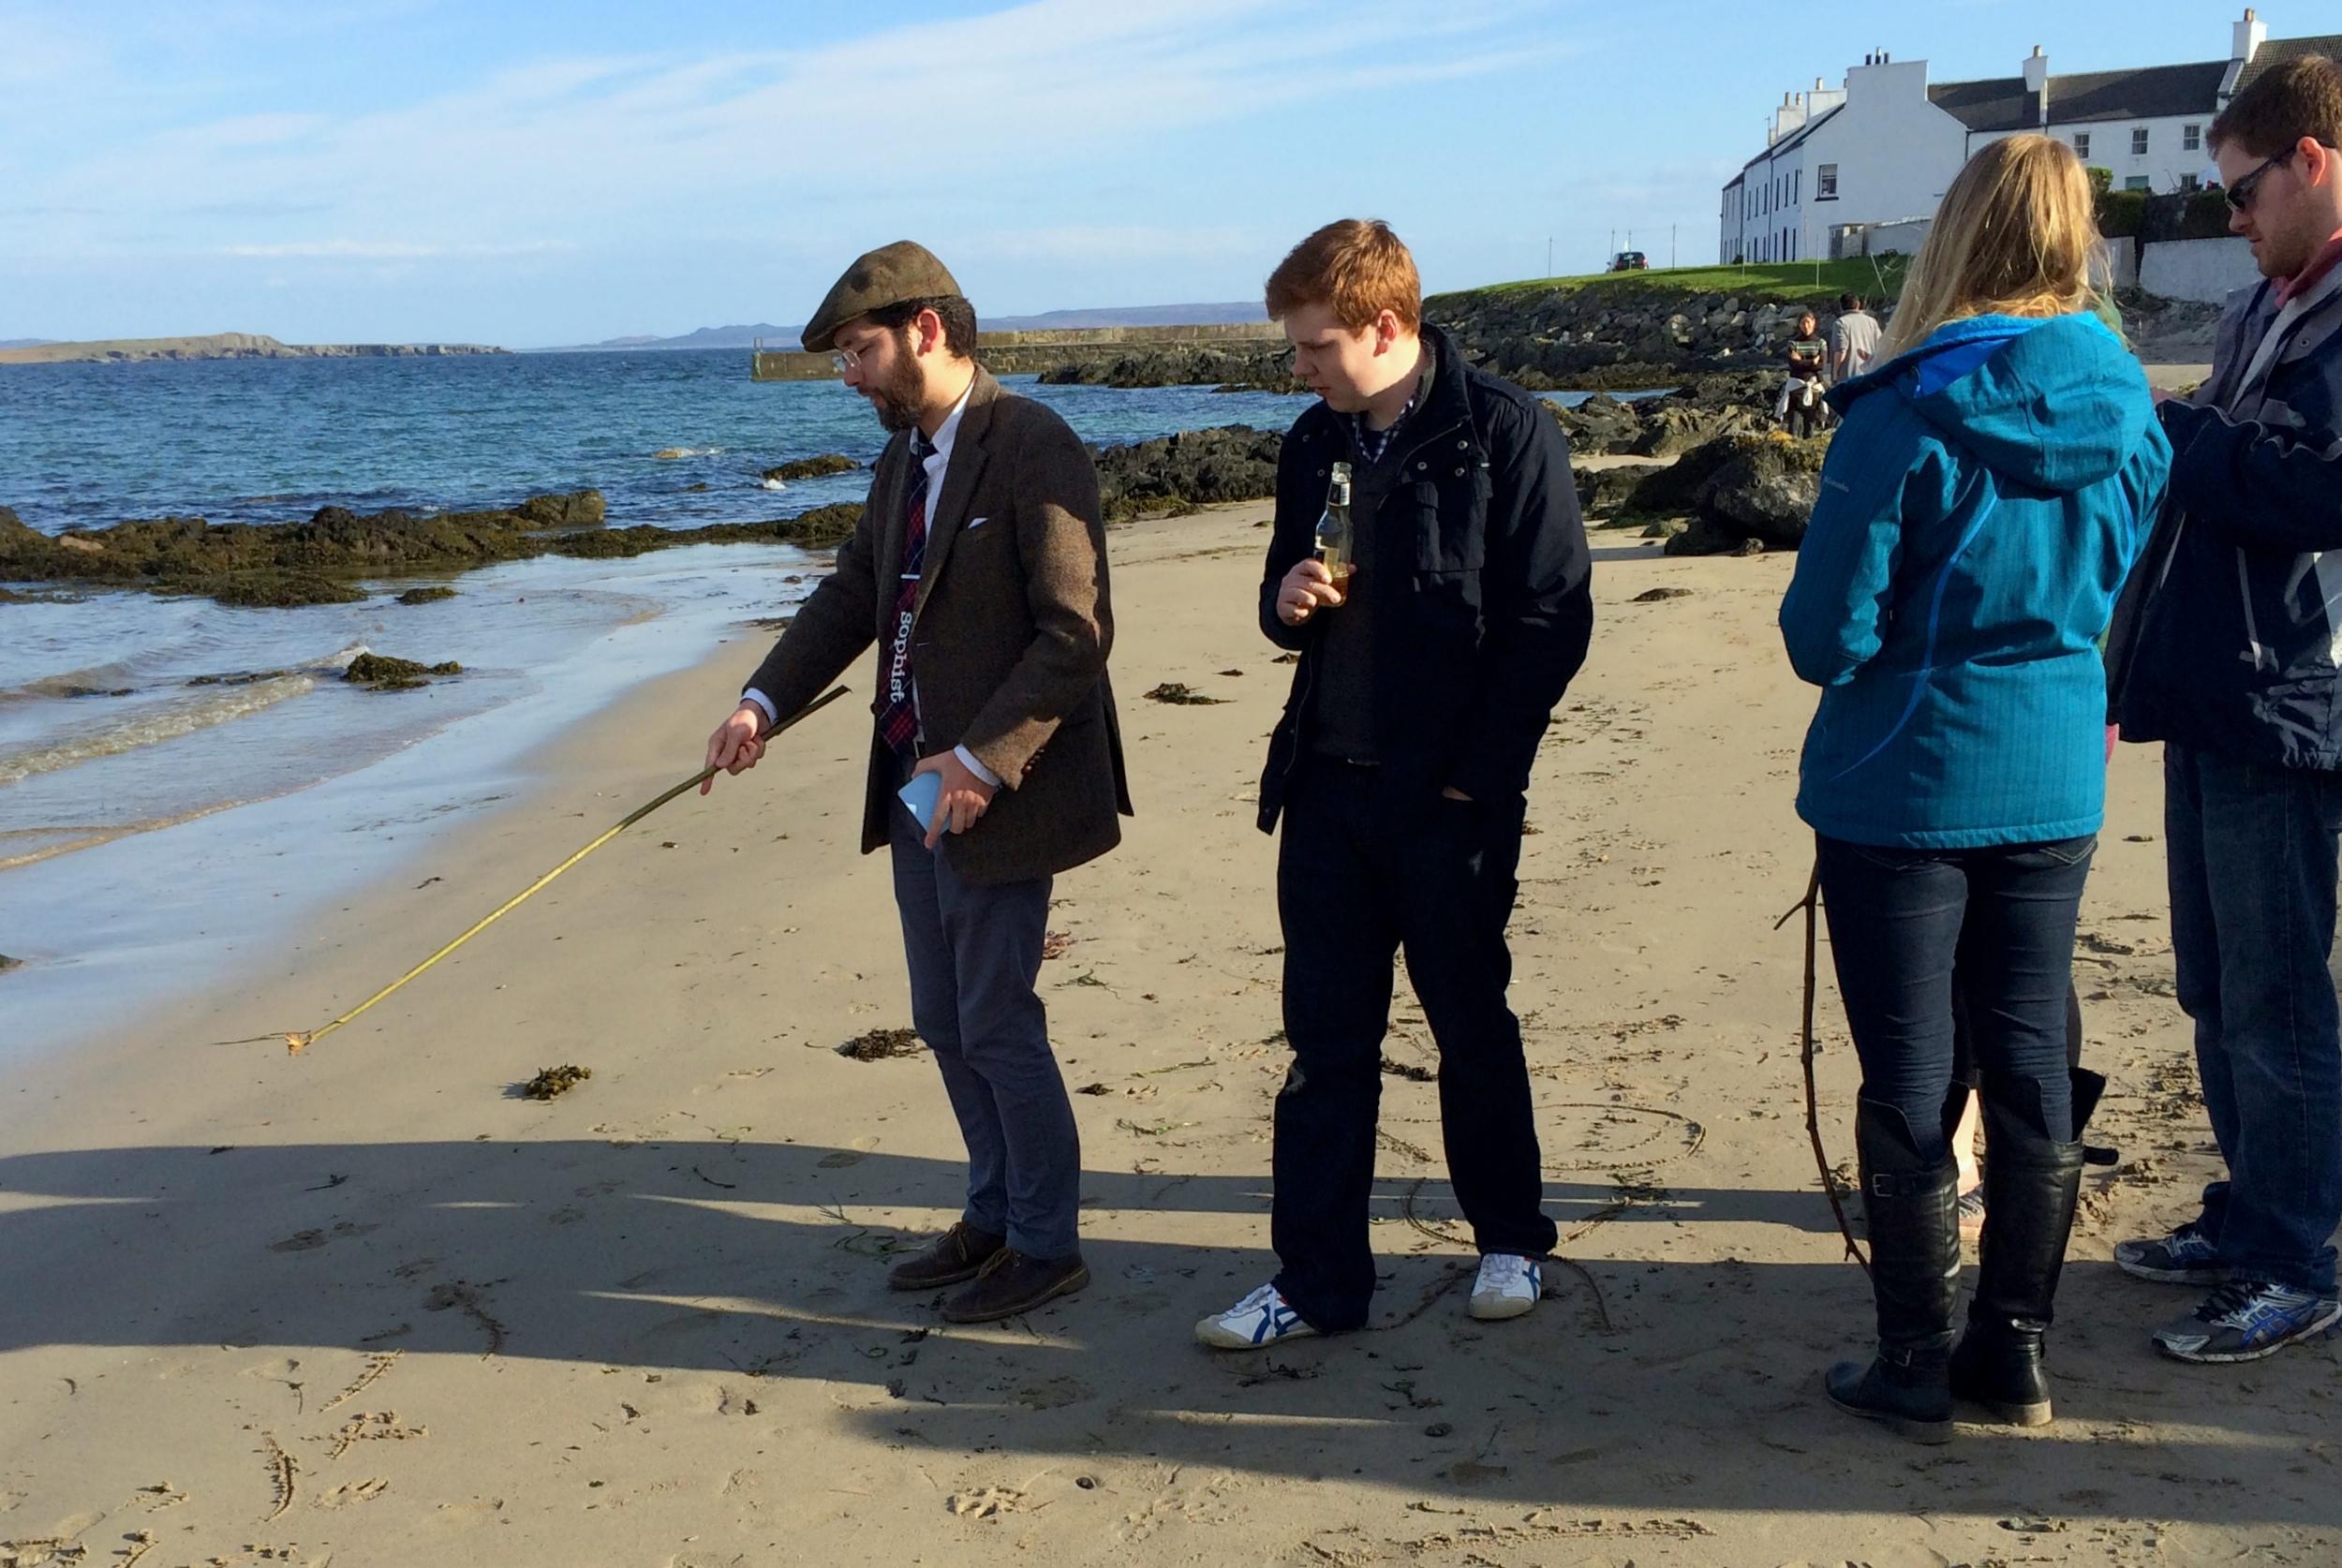 A shabby pedagogue on the beach in Port Charlotte, Scotland. (Photo: Mariana Vieira)